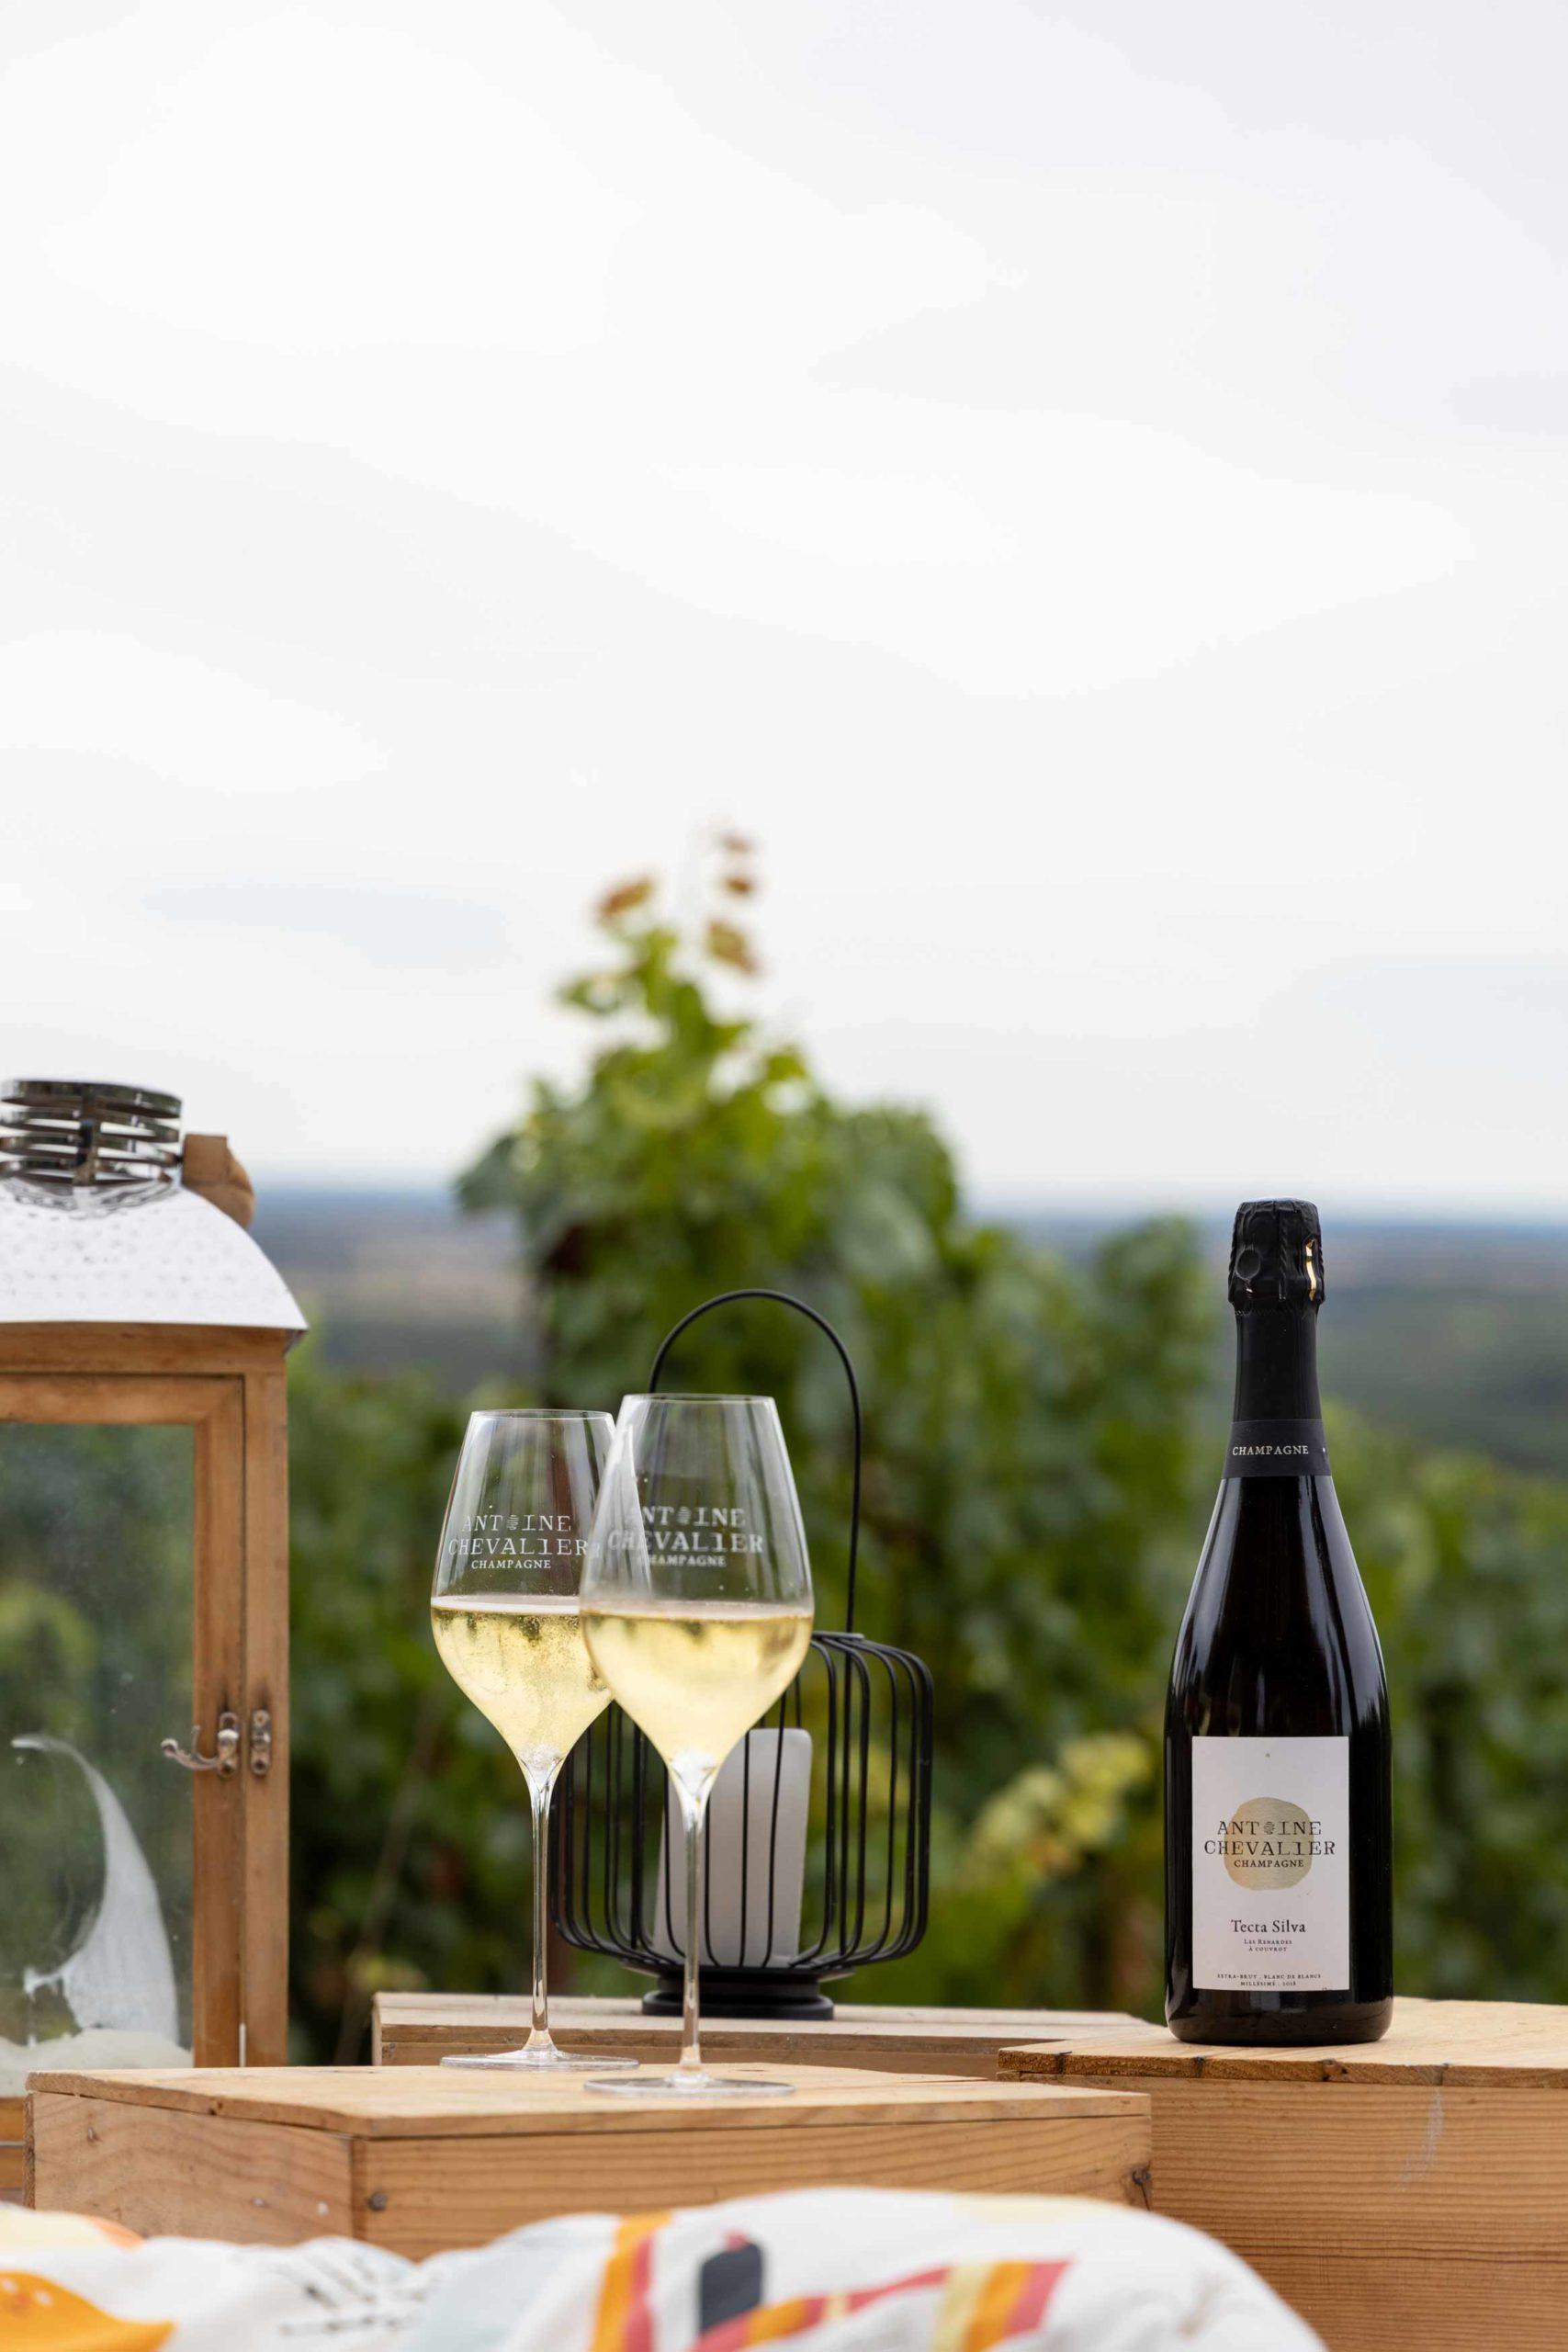 Reportage photo pour le Champagne Antoine Chevalier - Agence Discovery Reims & Paris